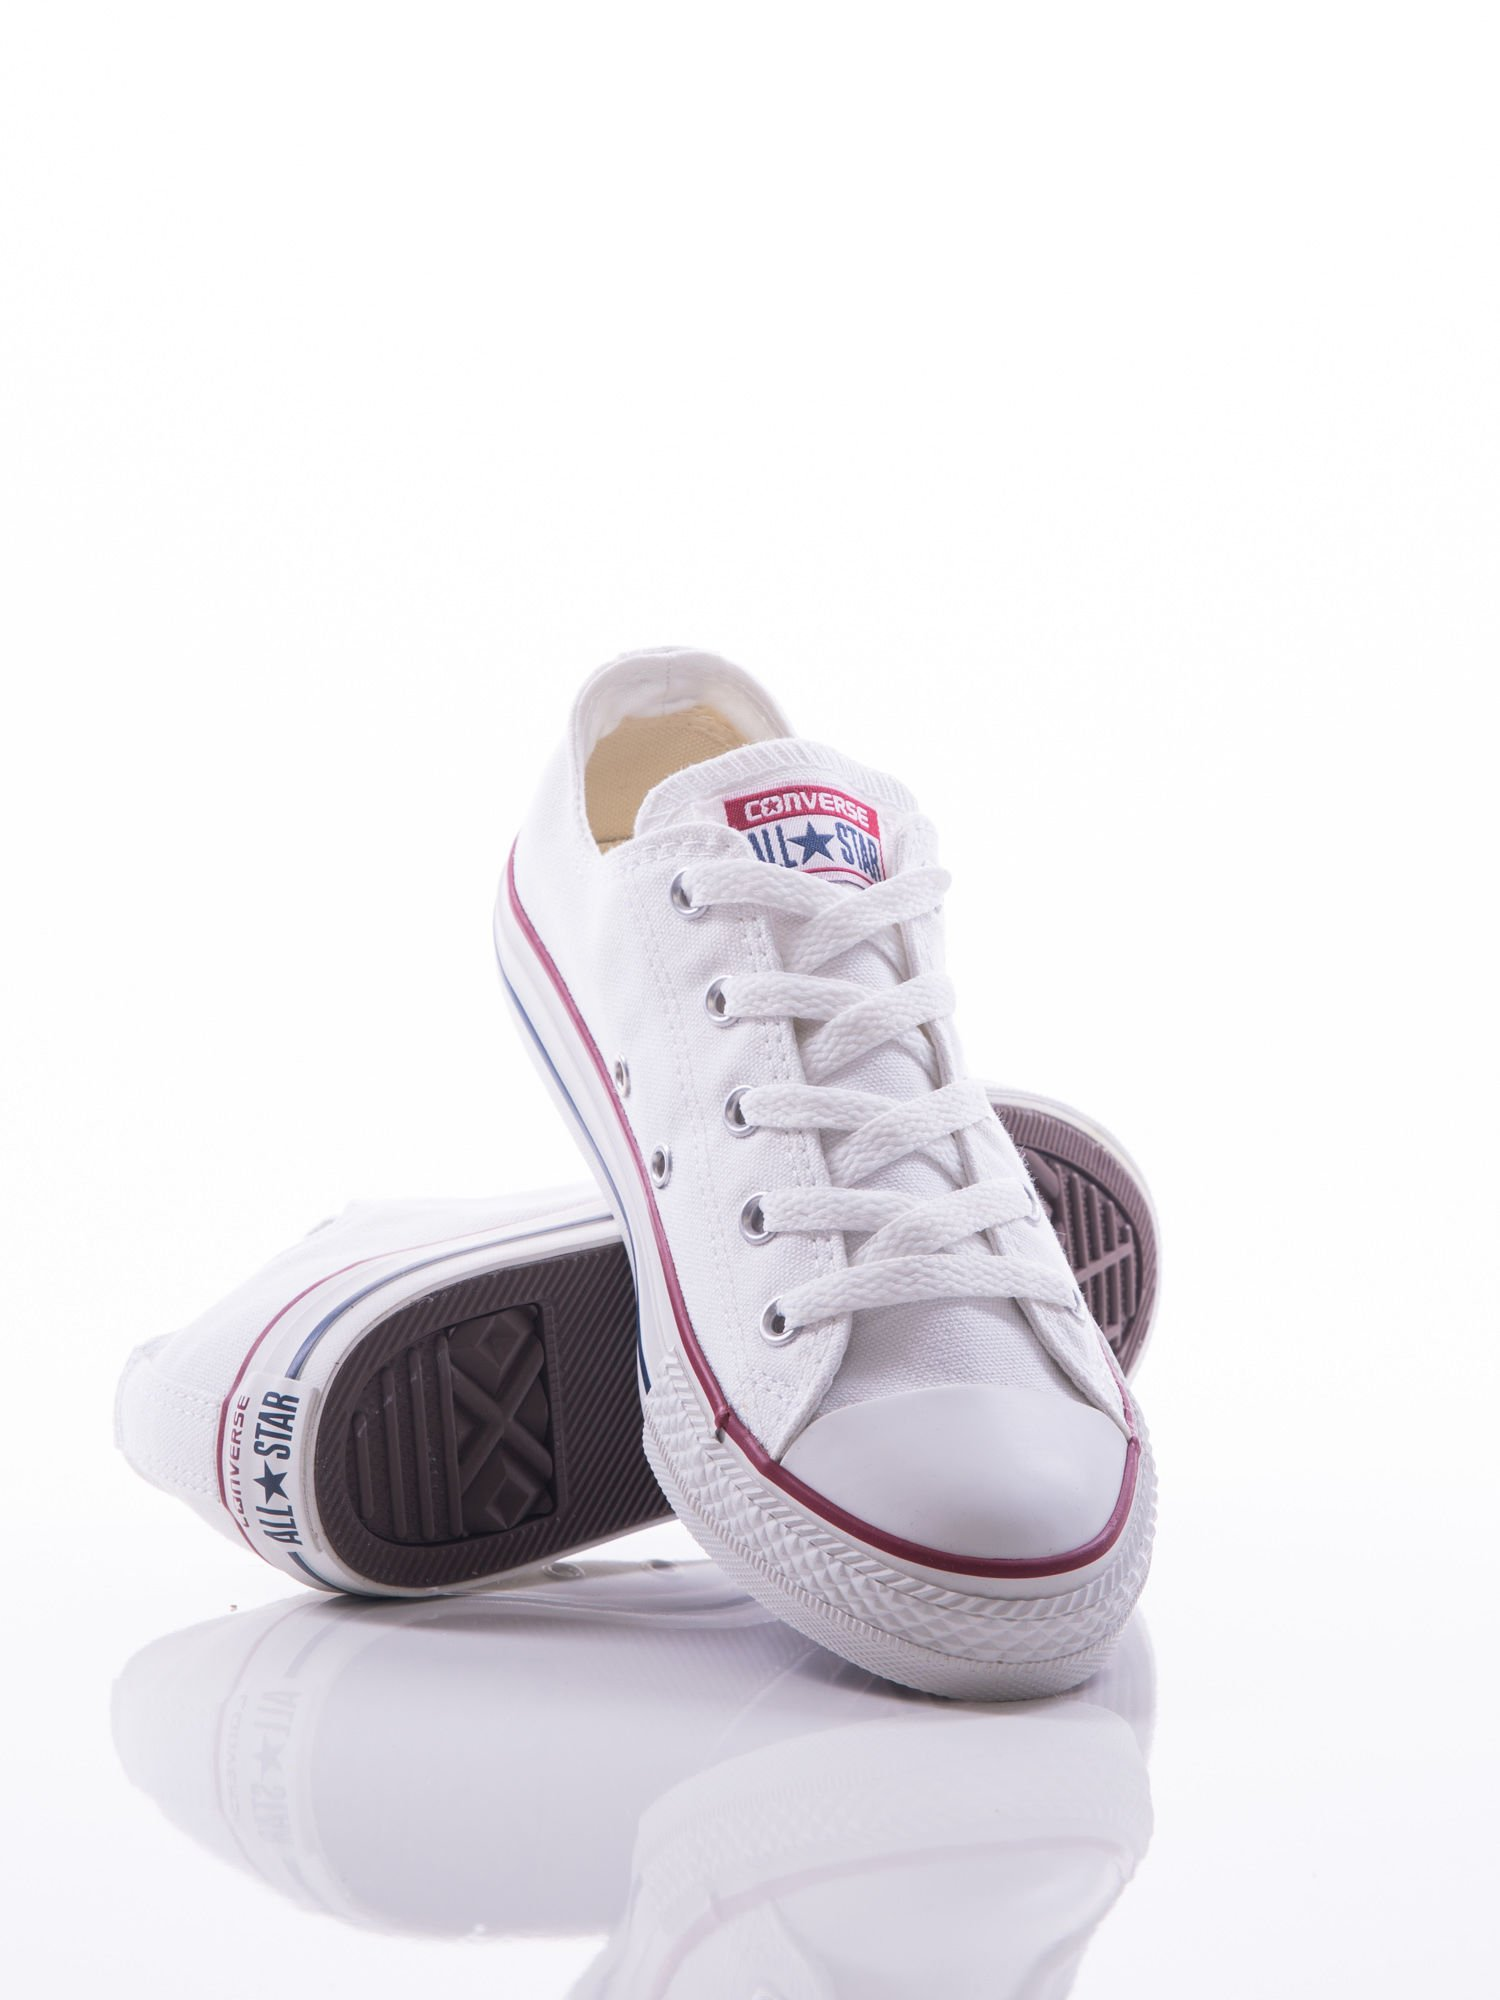 później moda designerska najniższa cena Białe trampki Converse